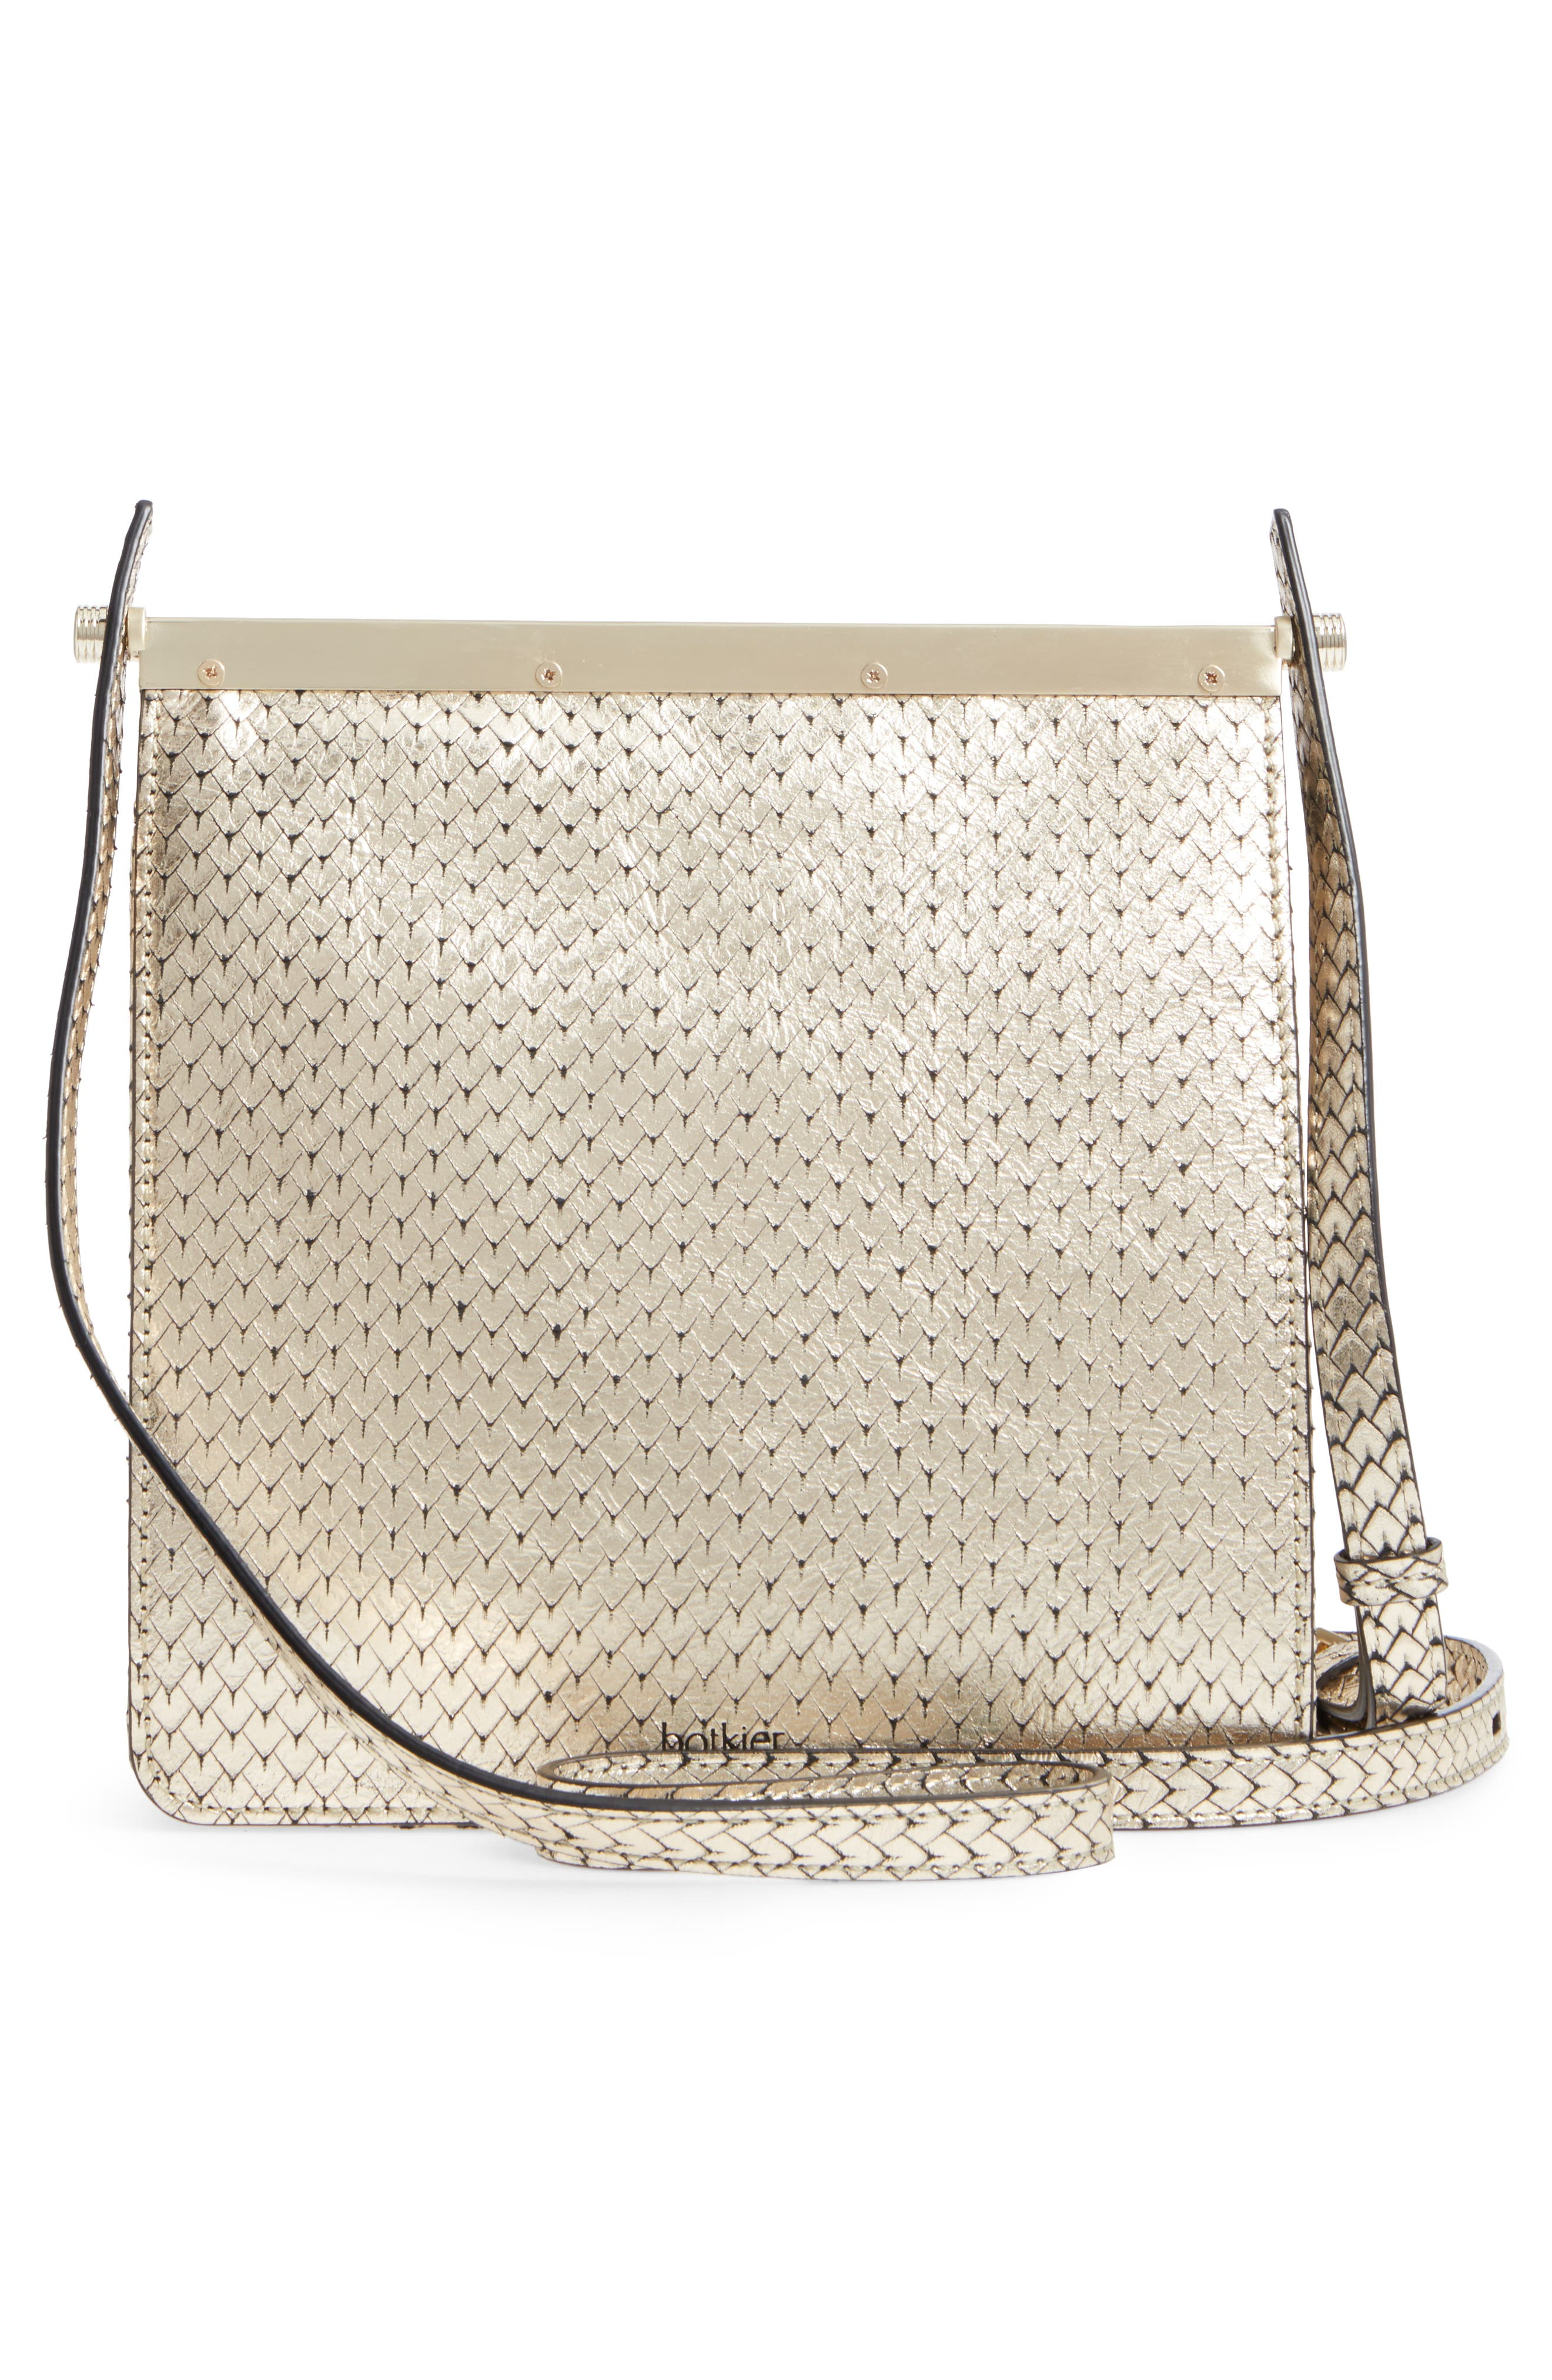 Crawford Calfskin Leather Crossbody Bag,                             Alternate thumbnail 3, color,                             Gold